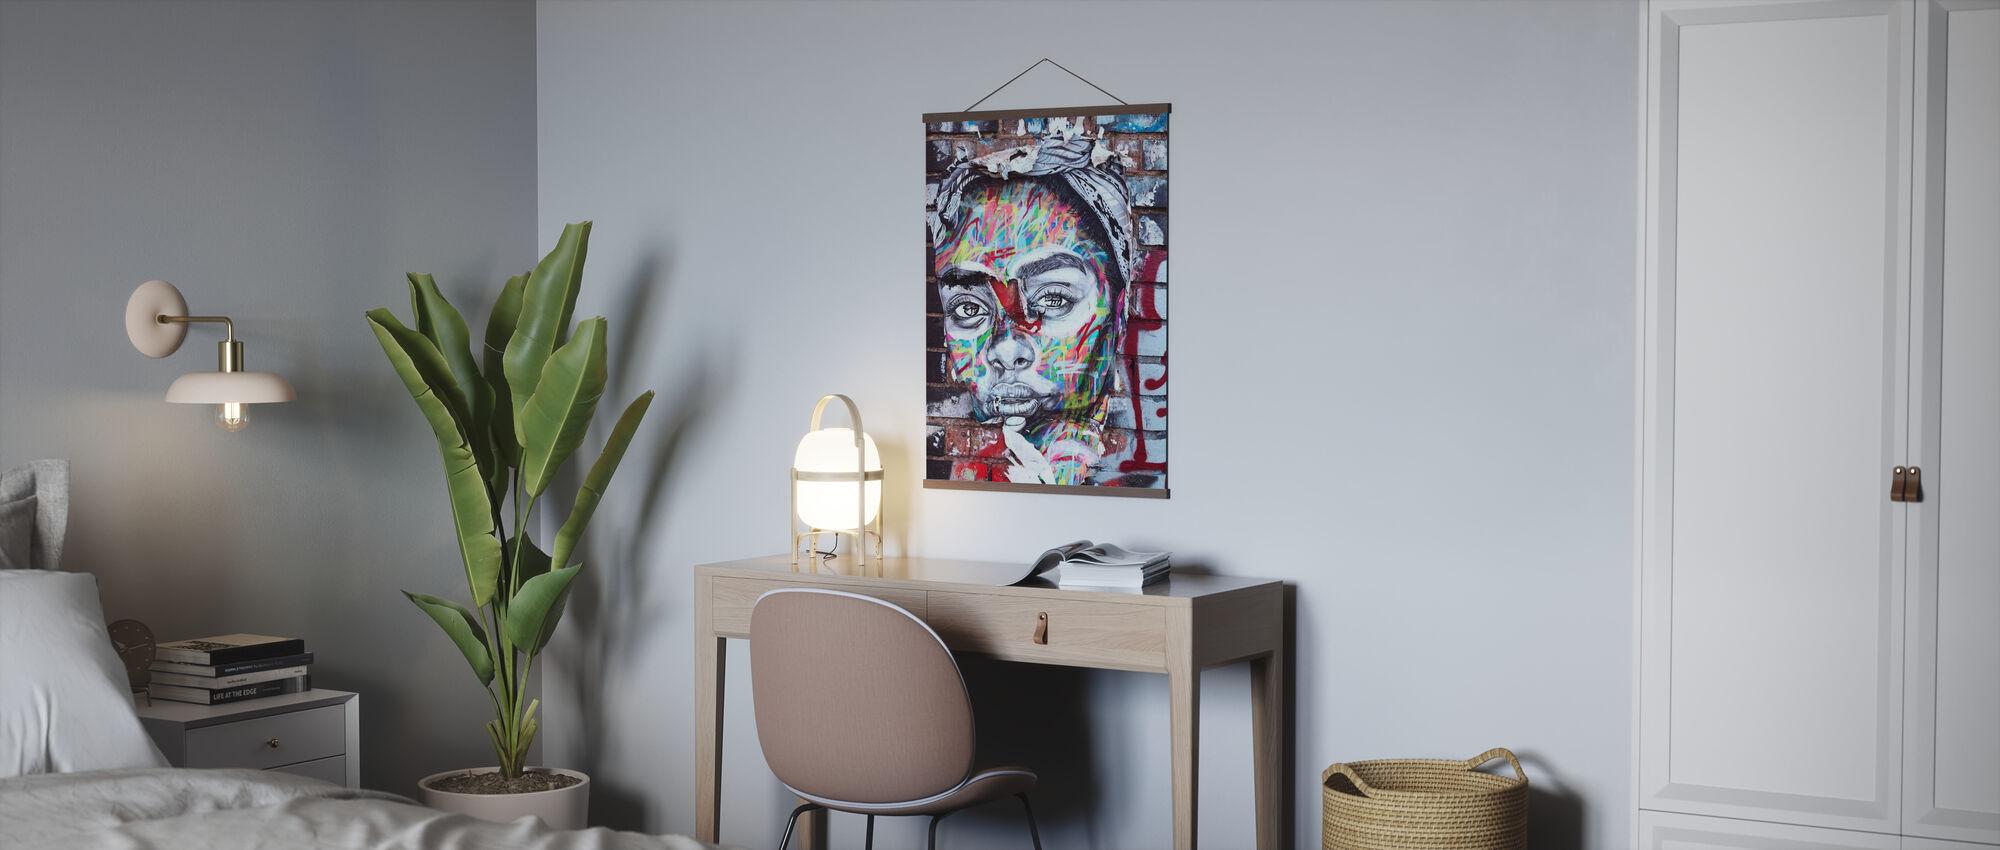 Street Art Portrait - Poster - Office